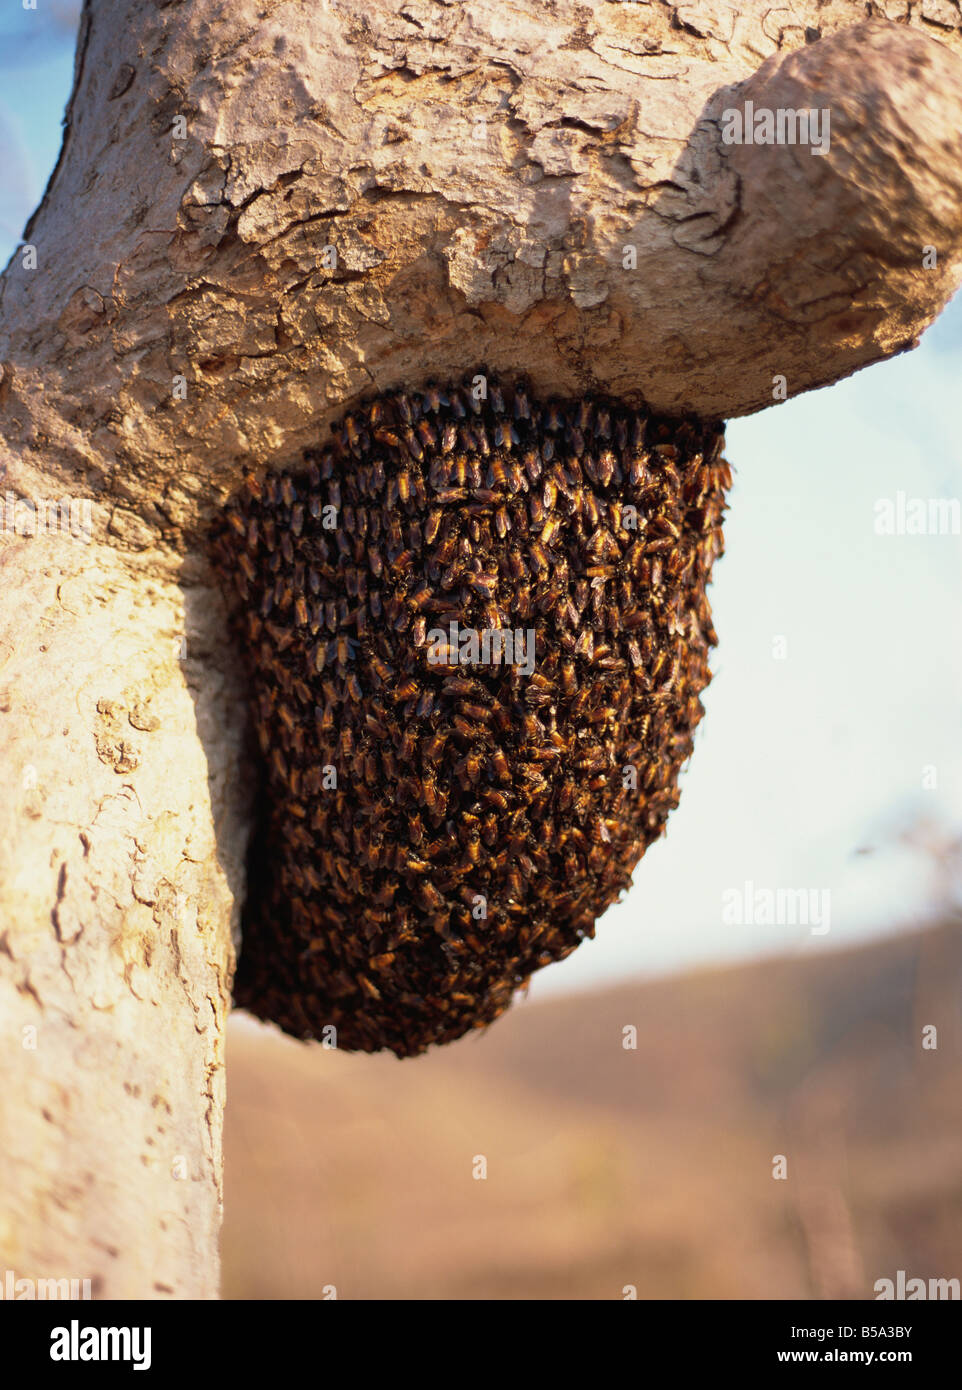 Swarm of wild bees hanging from a tree Maharashtra India Asia - Stock Image